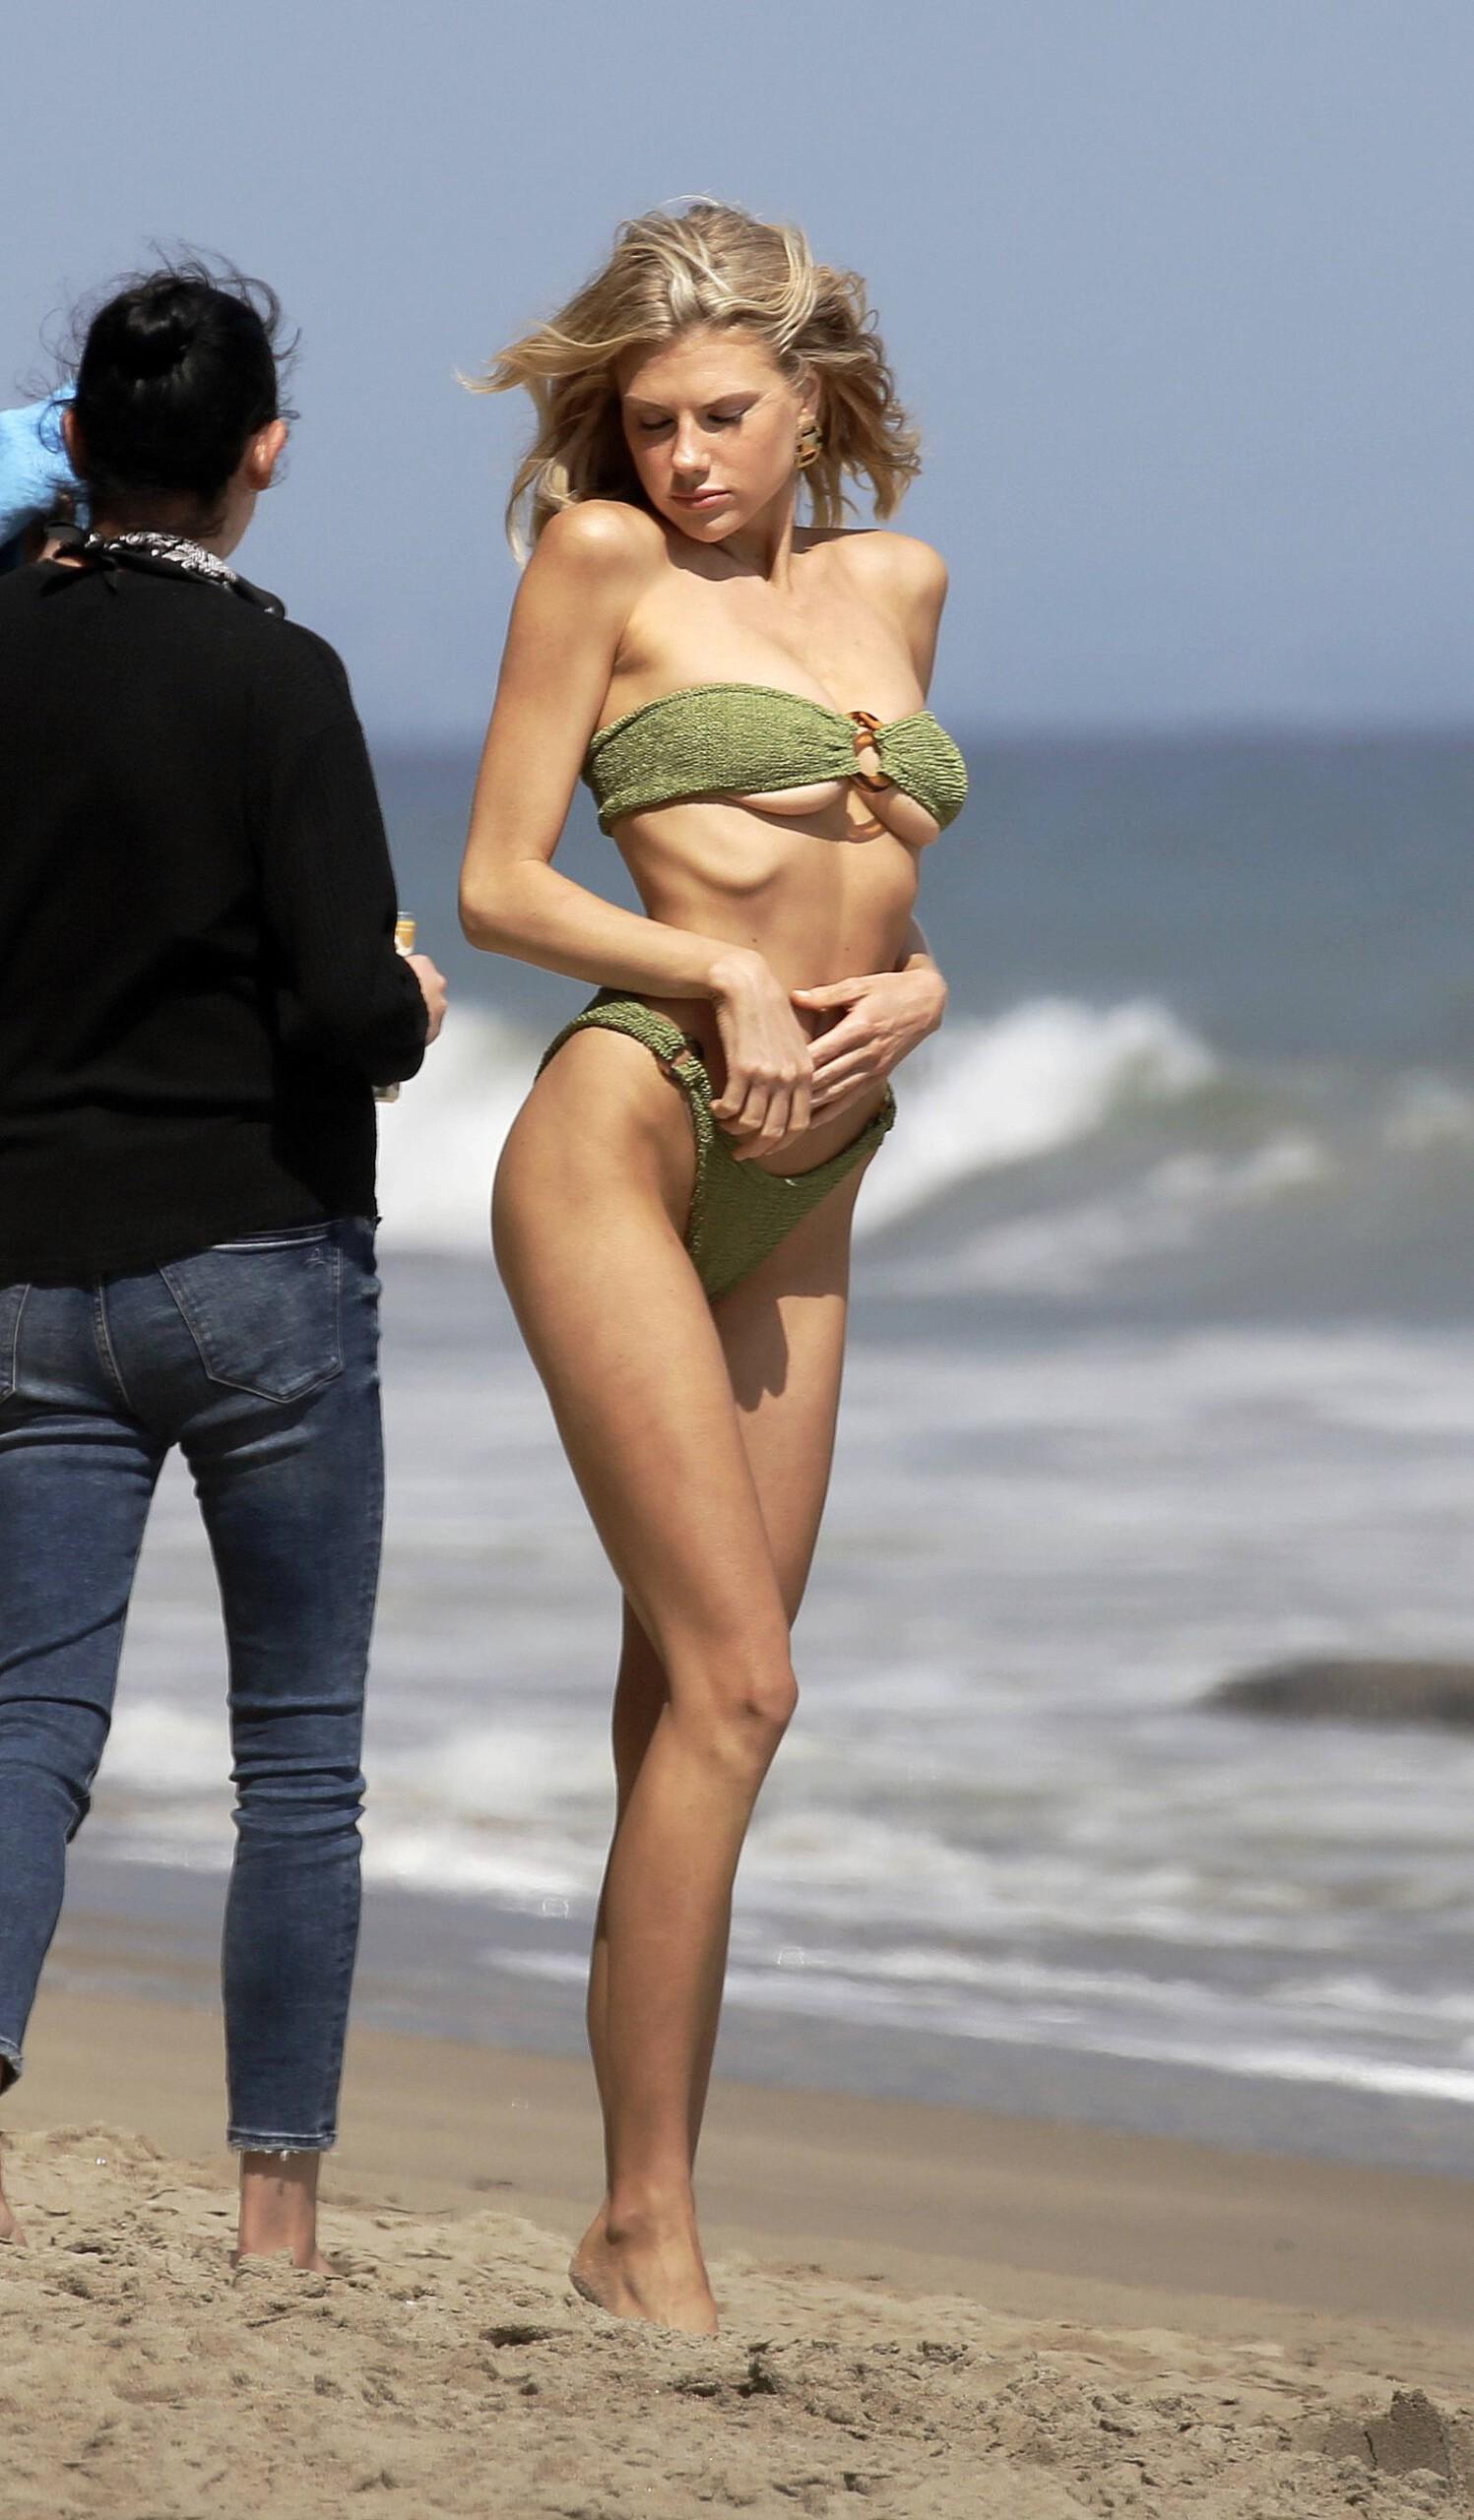 Charlotte Mckinney – Sexy Boobs In Tiny Bikini On The Beach In Los Angeles 0012